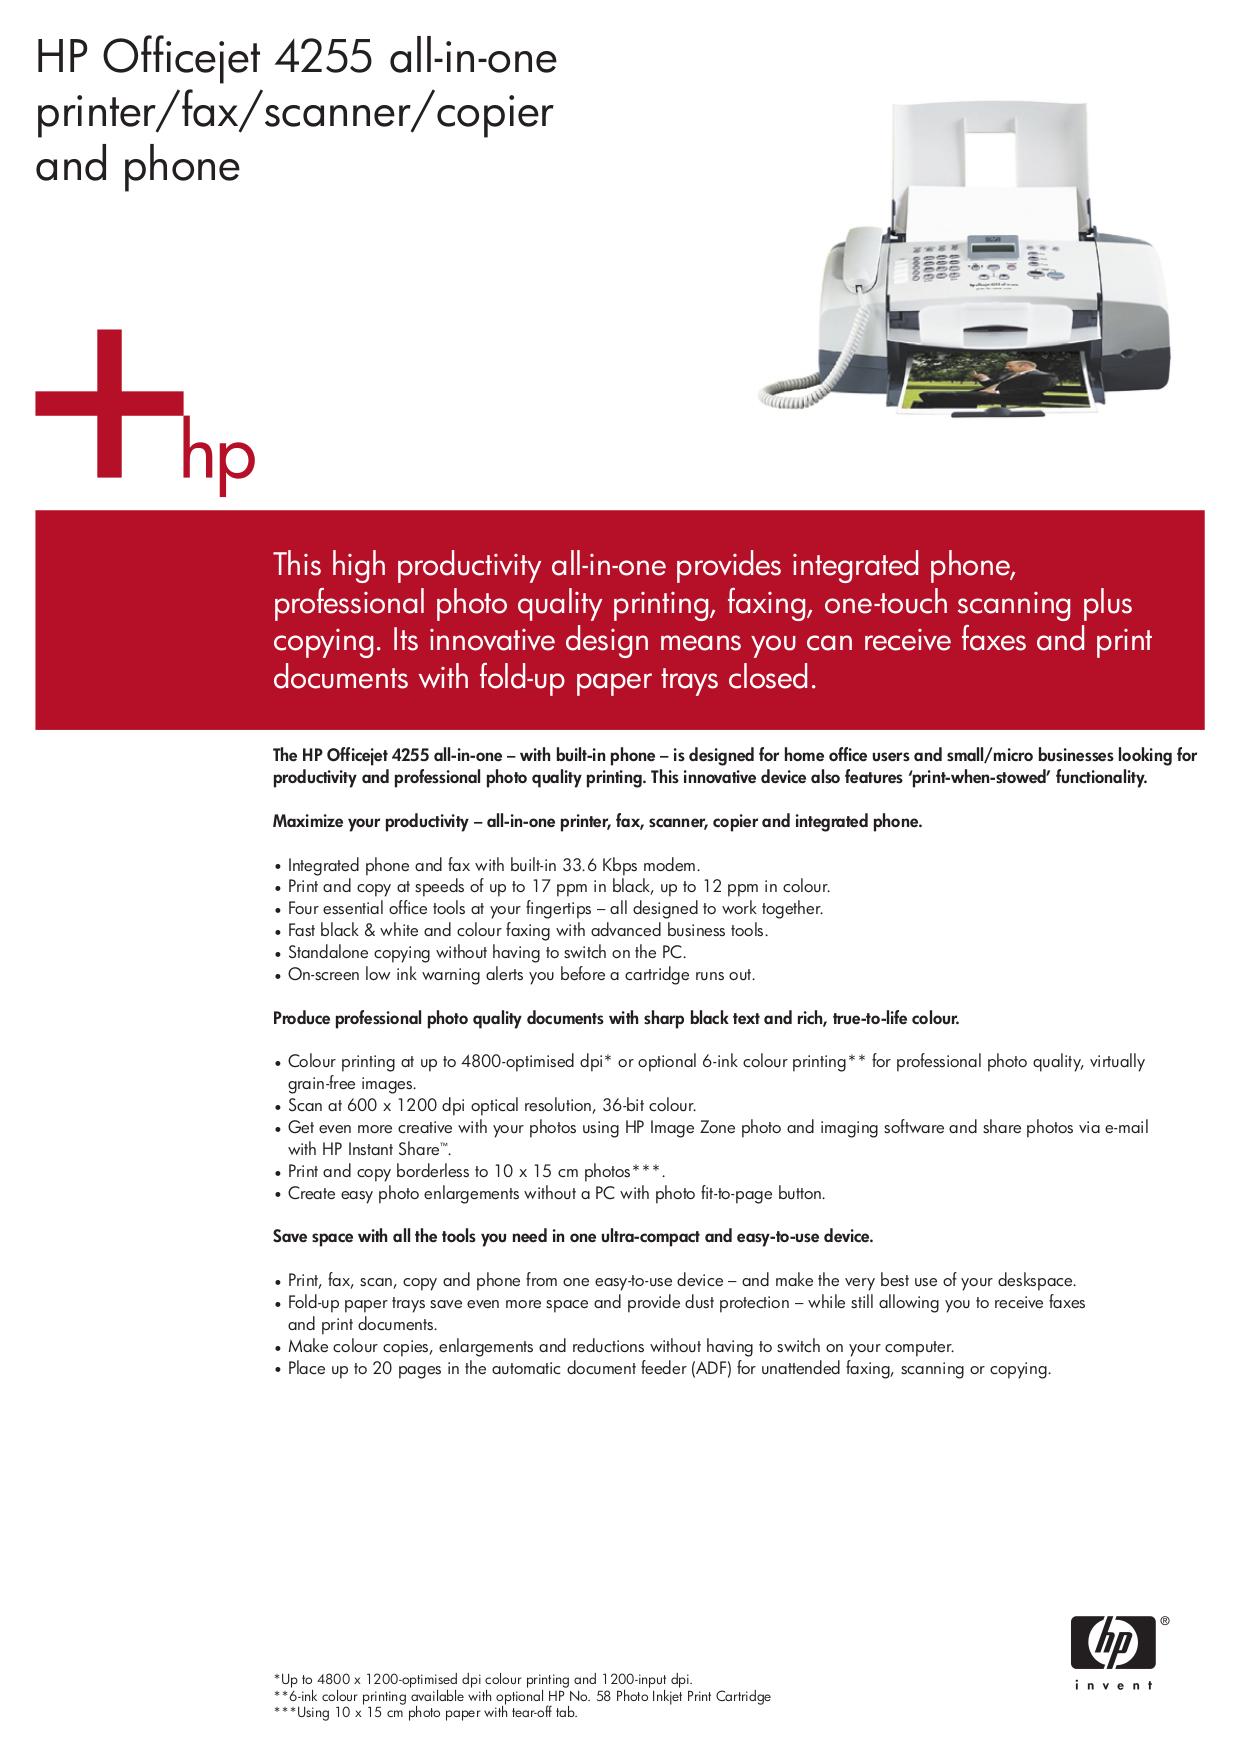 pdf for HP Multifunction Printer Officejet 4255 manual